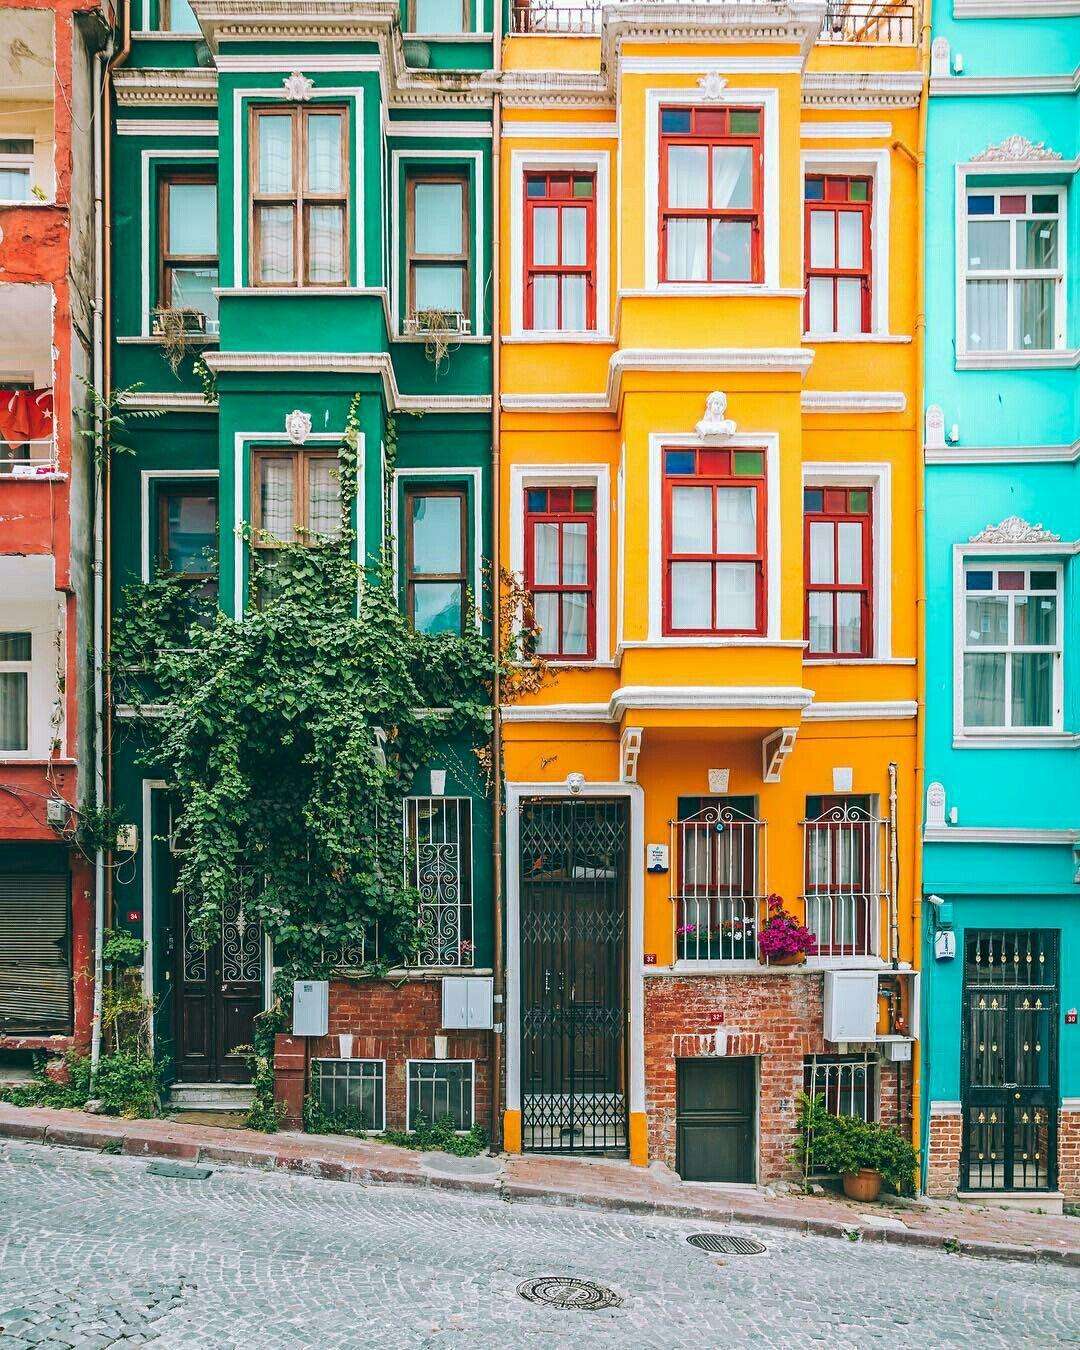 Istambul Turquia Mary Quincy Istambul Turquia Lugares I 2020 Baggrund Rejser Foto Inspiration